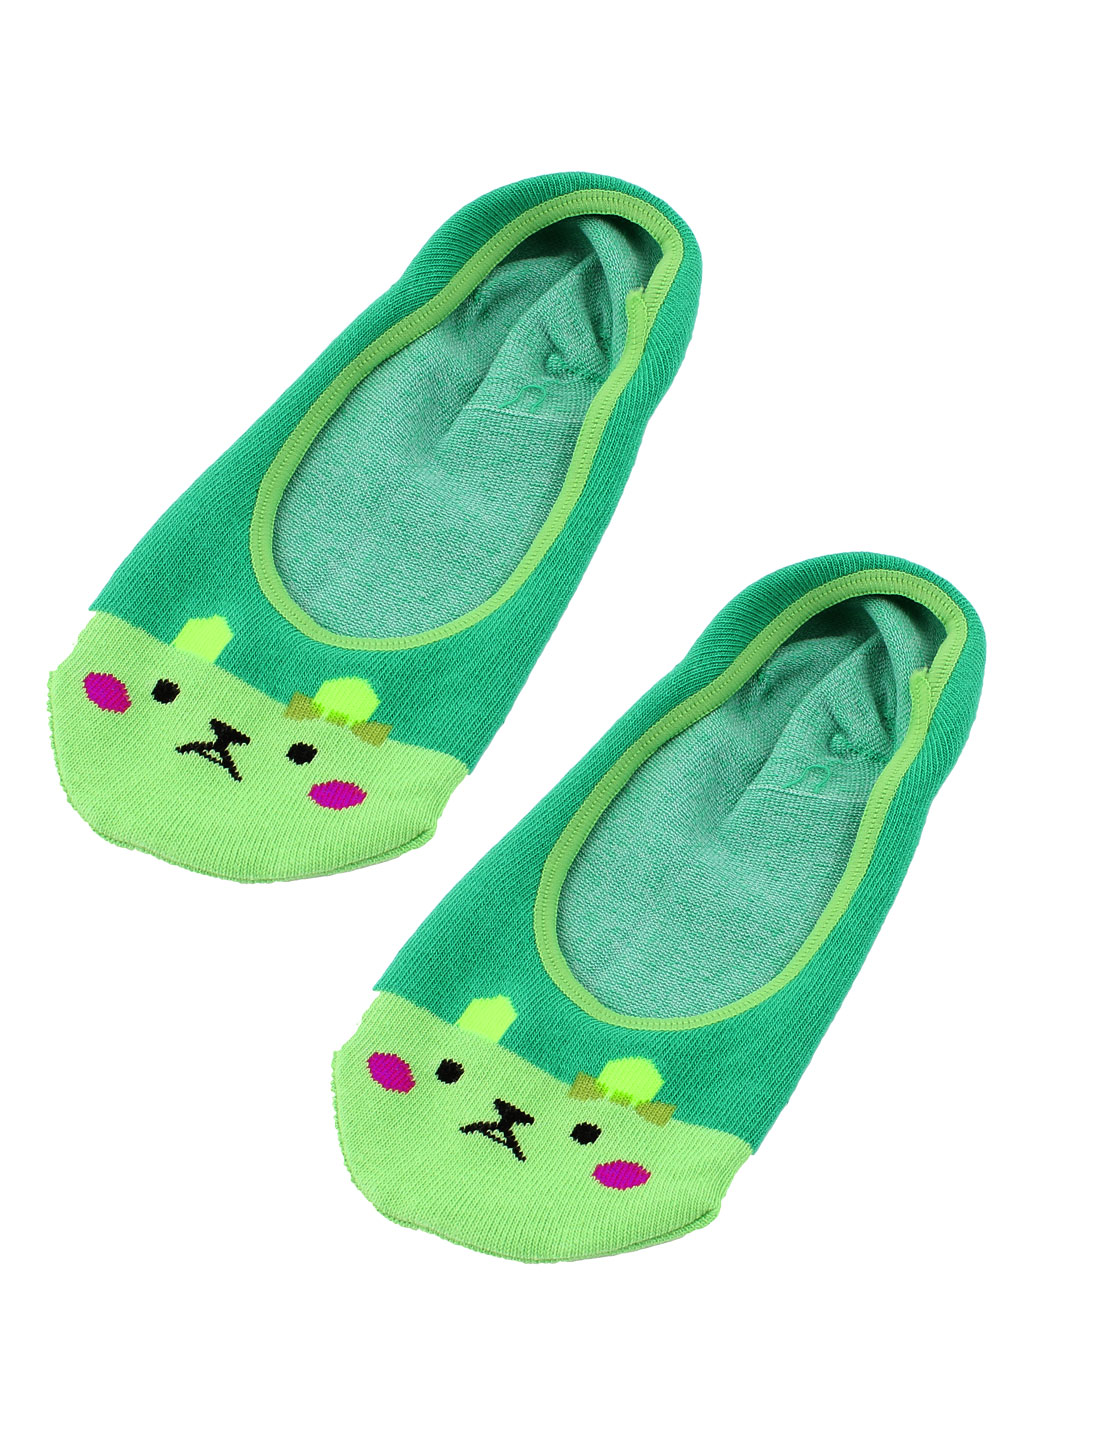 Pair Cartoon Print Green Cotton Blends Elastic Ballet Invisible Footies Low Cut Liner Boat Socks for Women